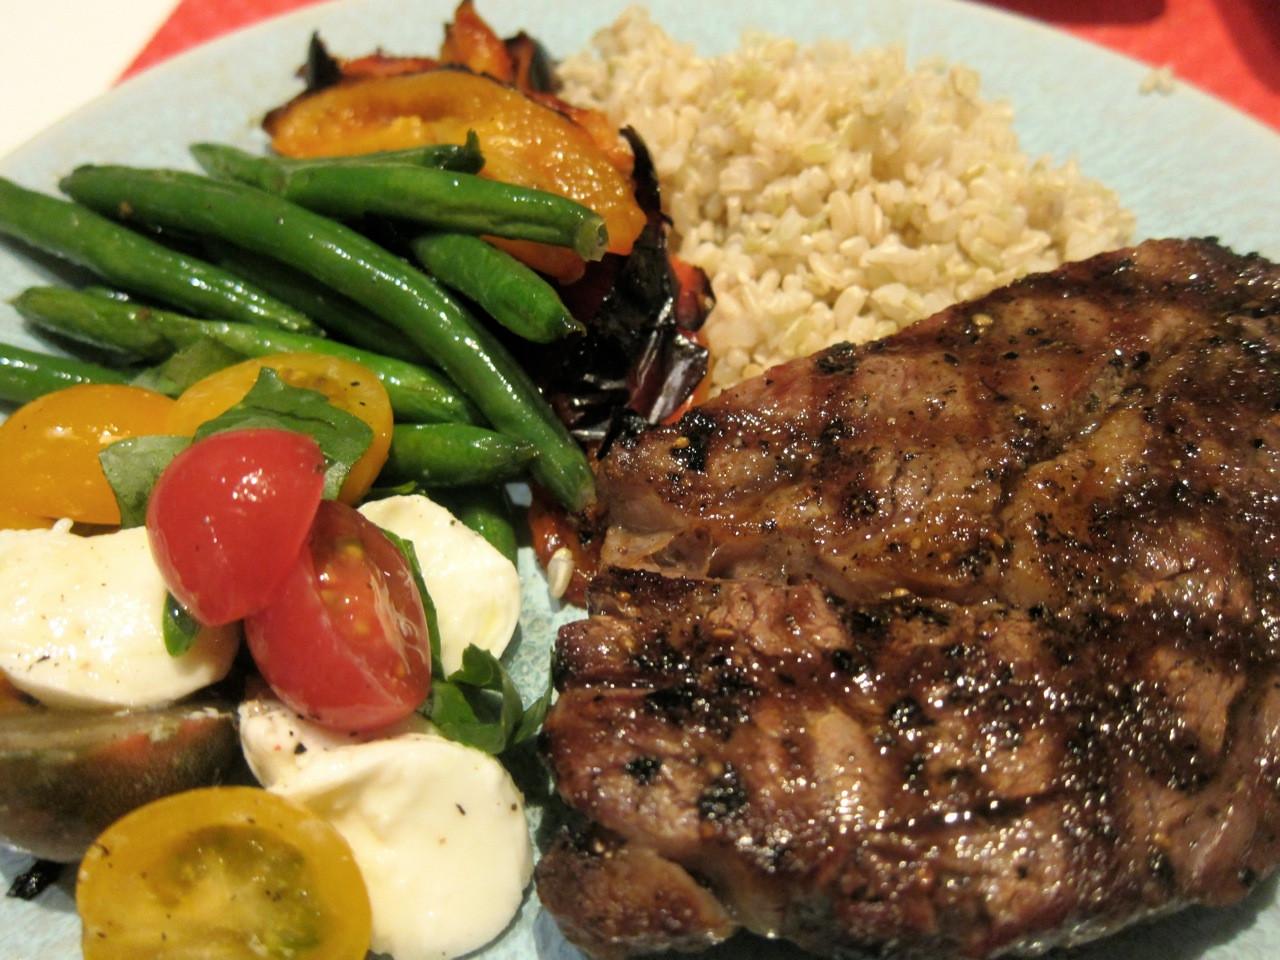 Steak Dinner Sides  Living Deliciously in SoCal Cook FJ Steak Dinner 1